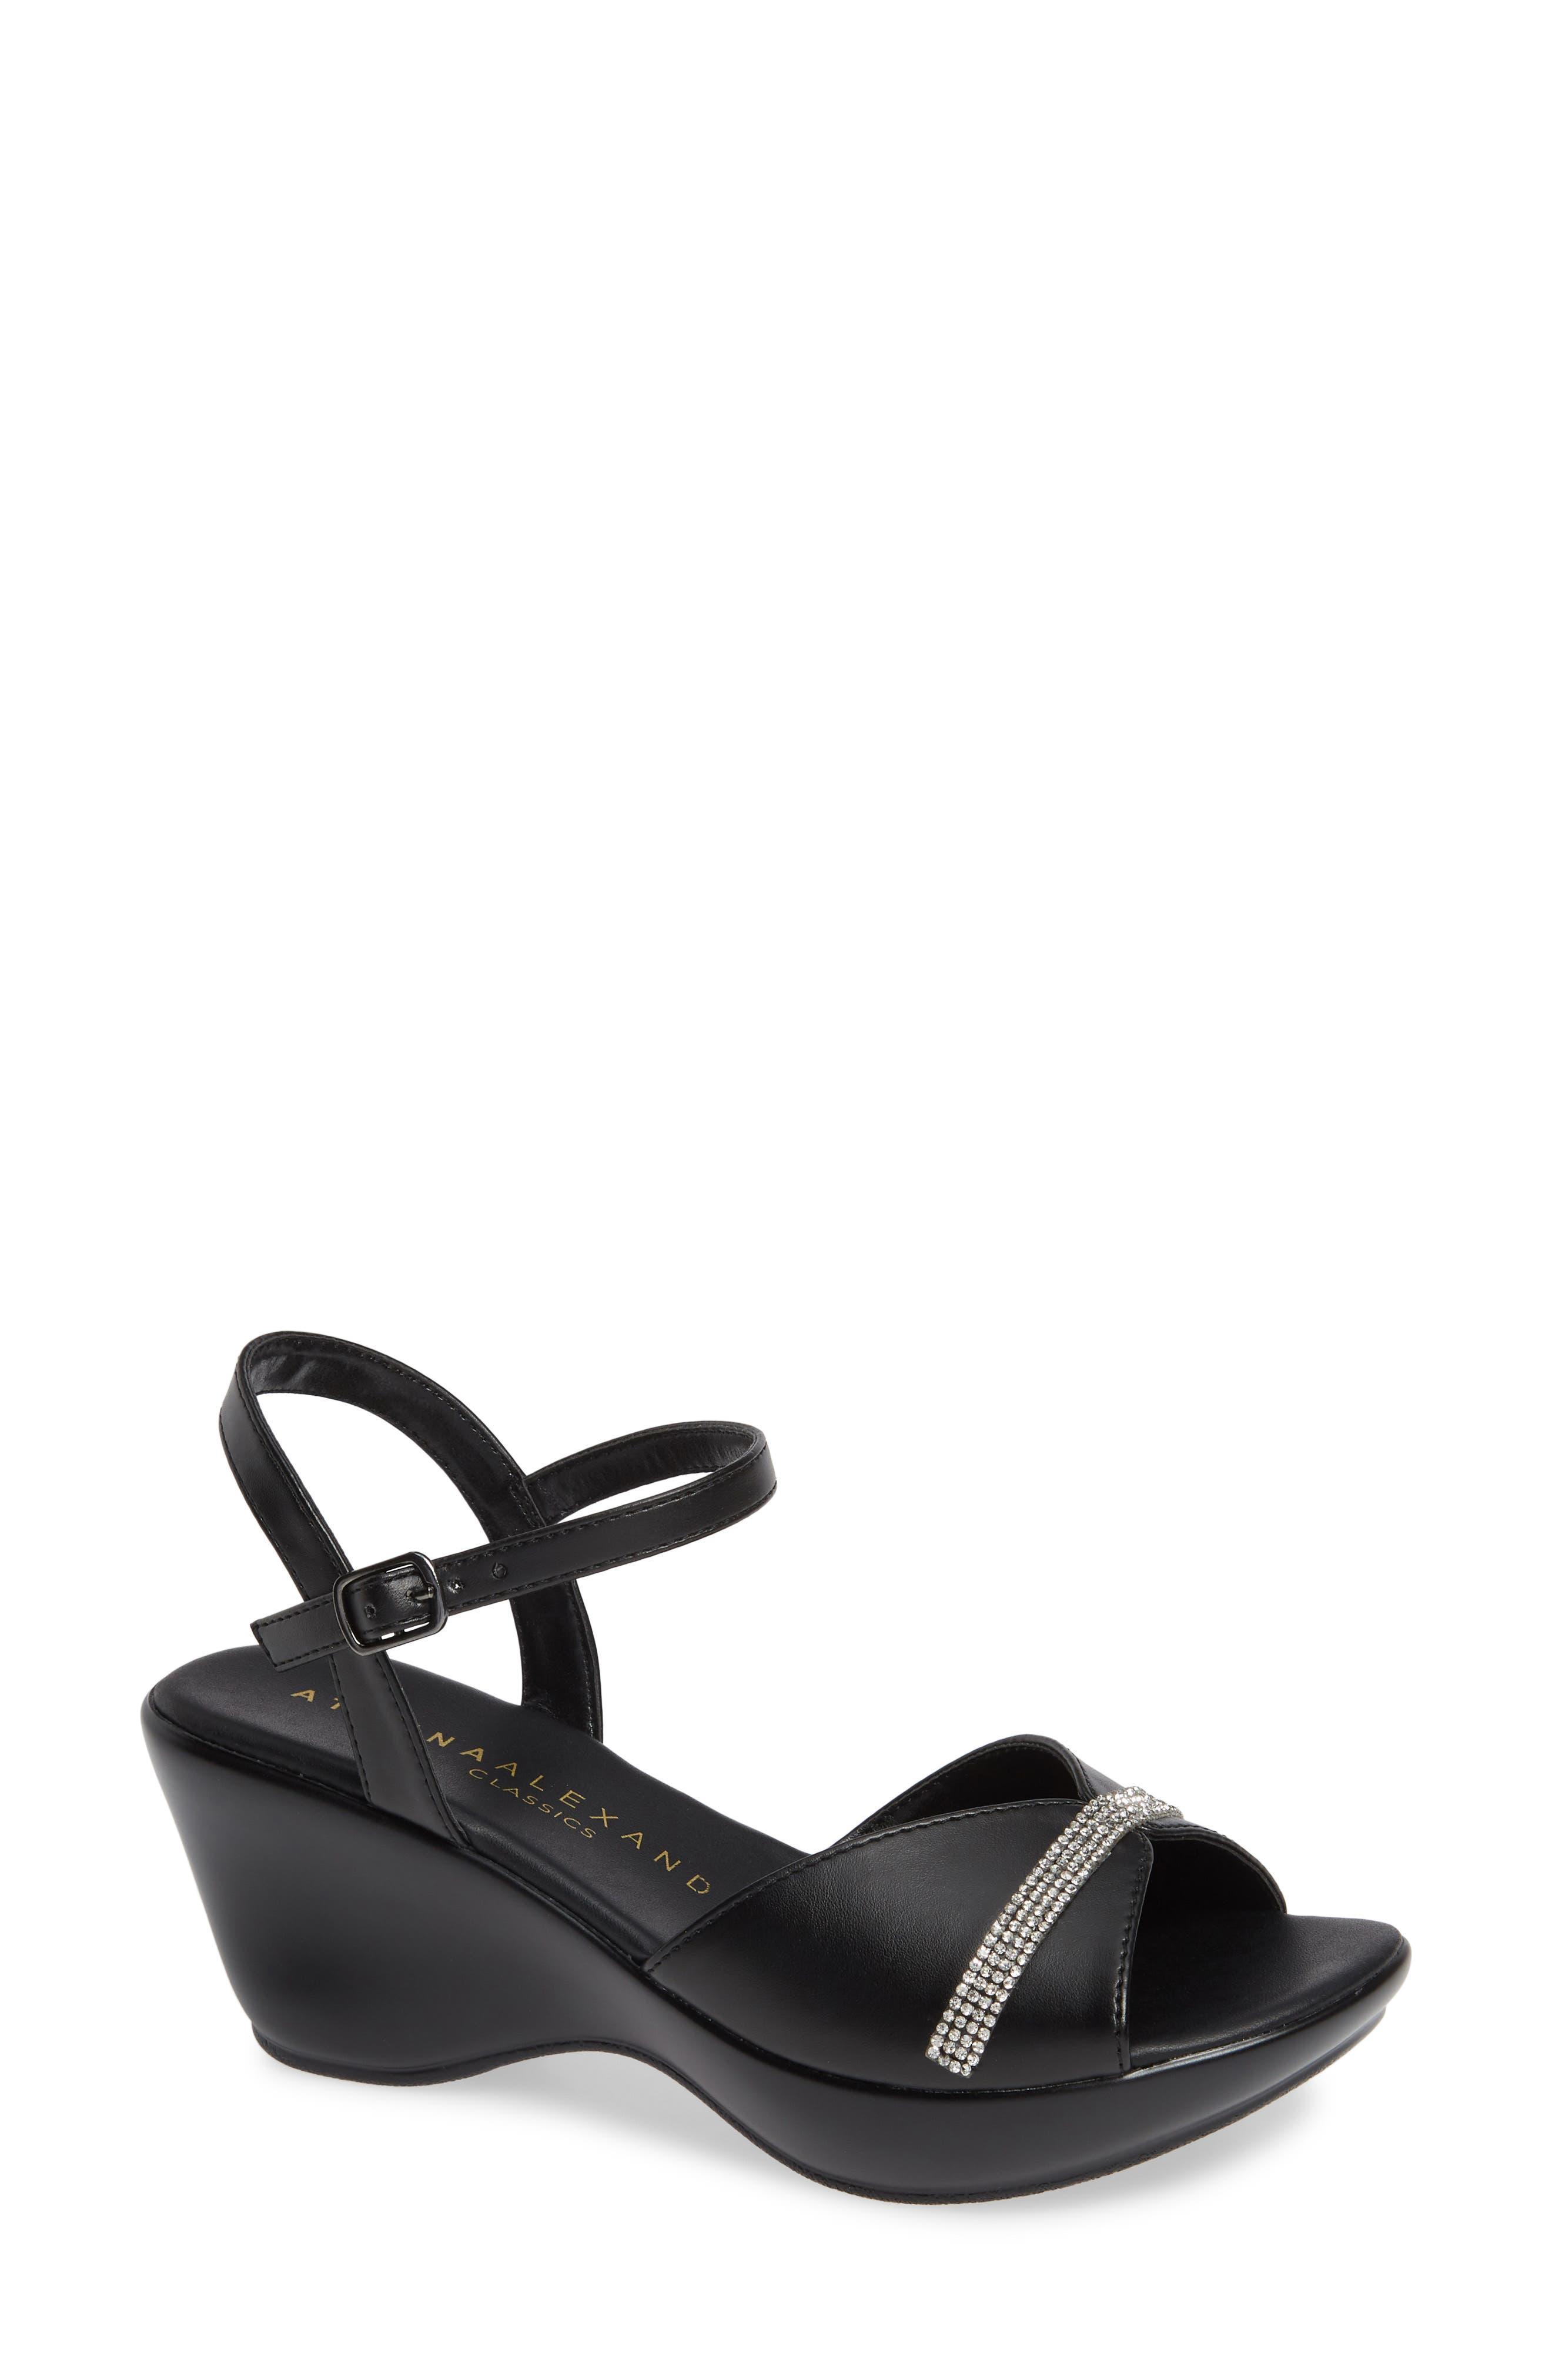 Ambling Wedge Sandal, Main, color, BLACK